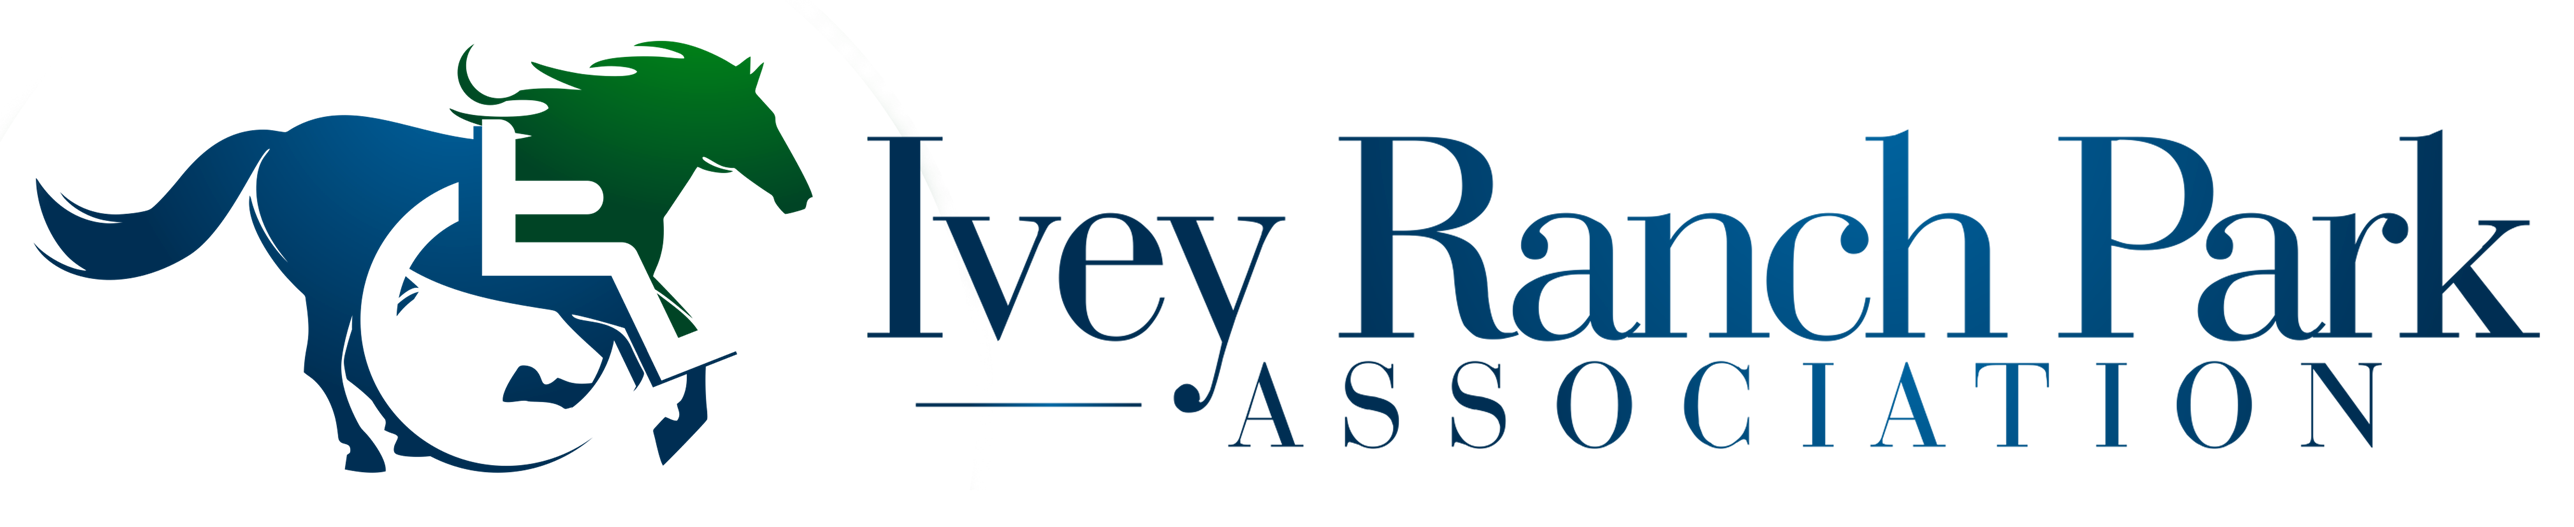 Ivey logo - horizontal